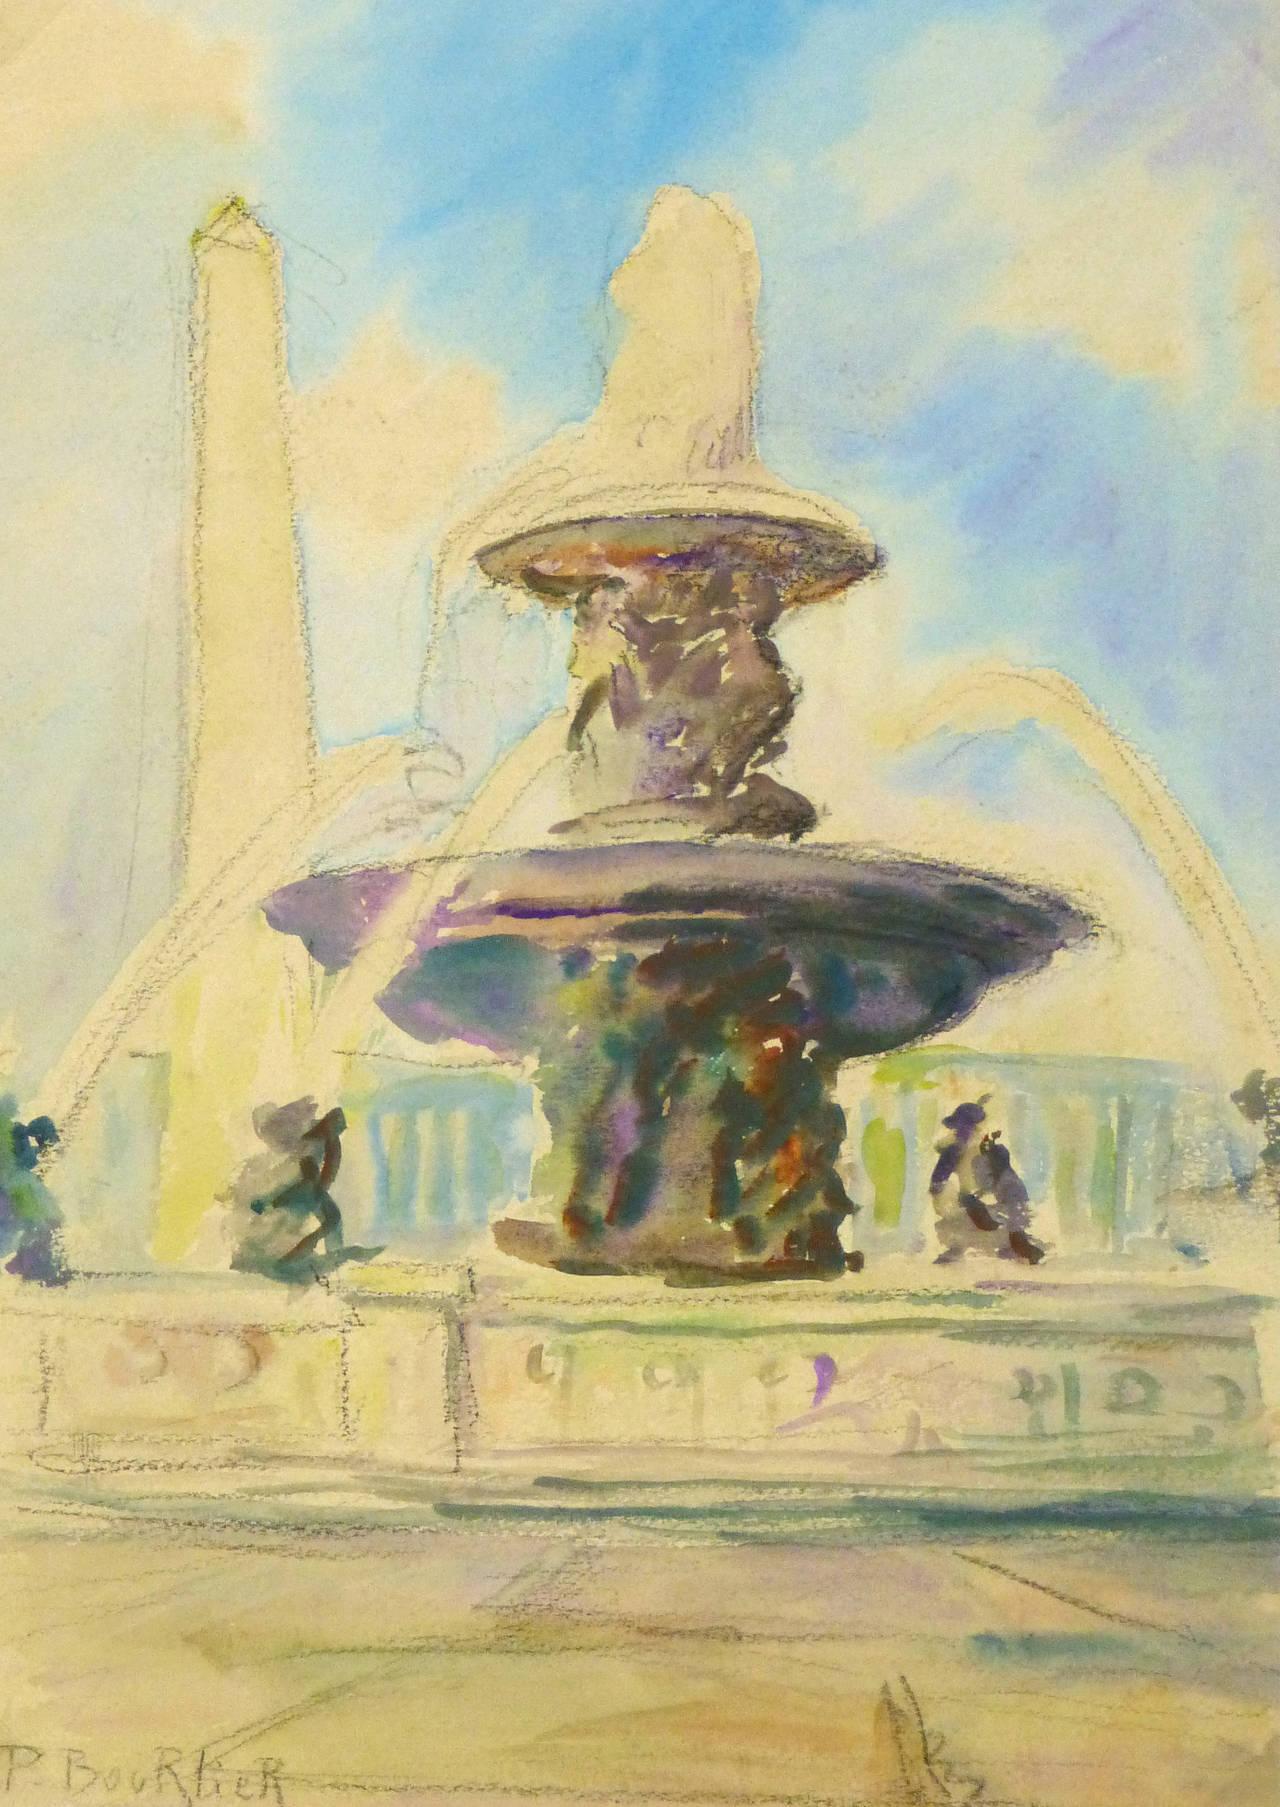 Vintage French Watercolor - Place de la Concorde, Paris